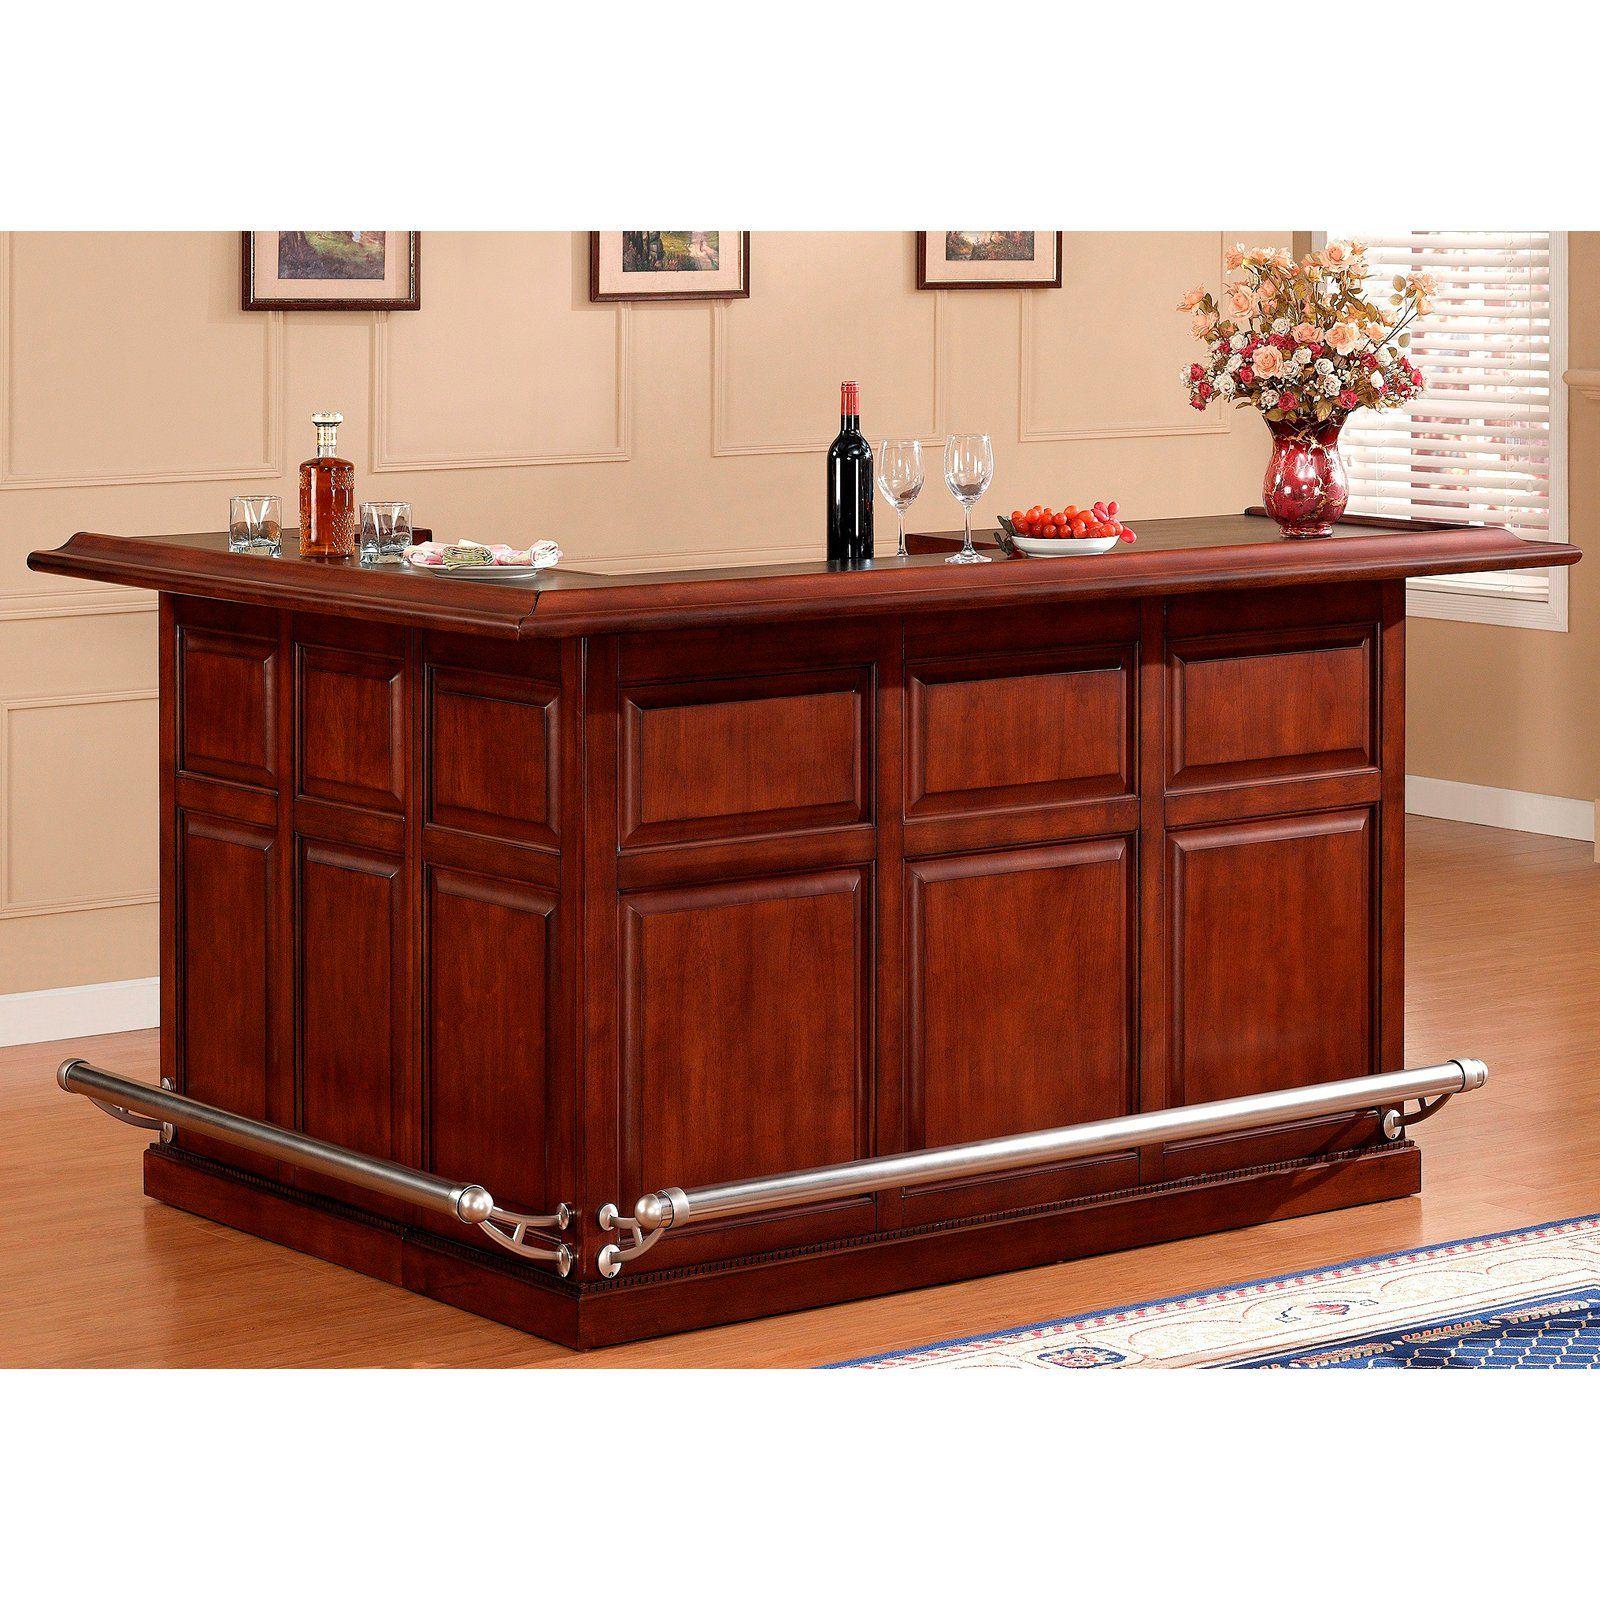 Ahb Catania Return Bar Navajo Www Hayneedle Com Bar Furniture Home Bar Cabinet Home Bar Furniture